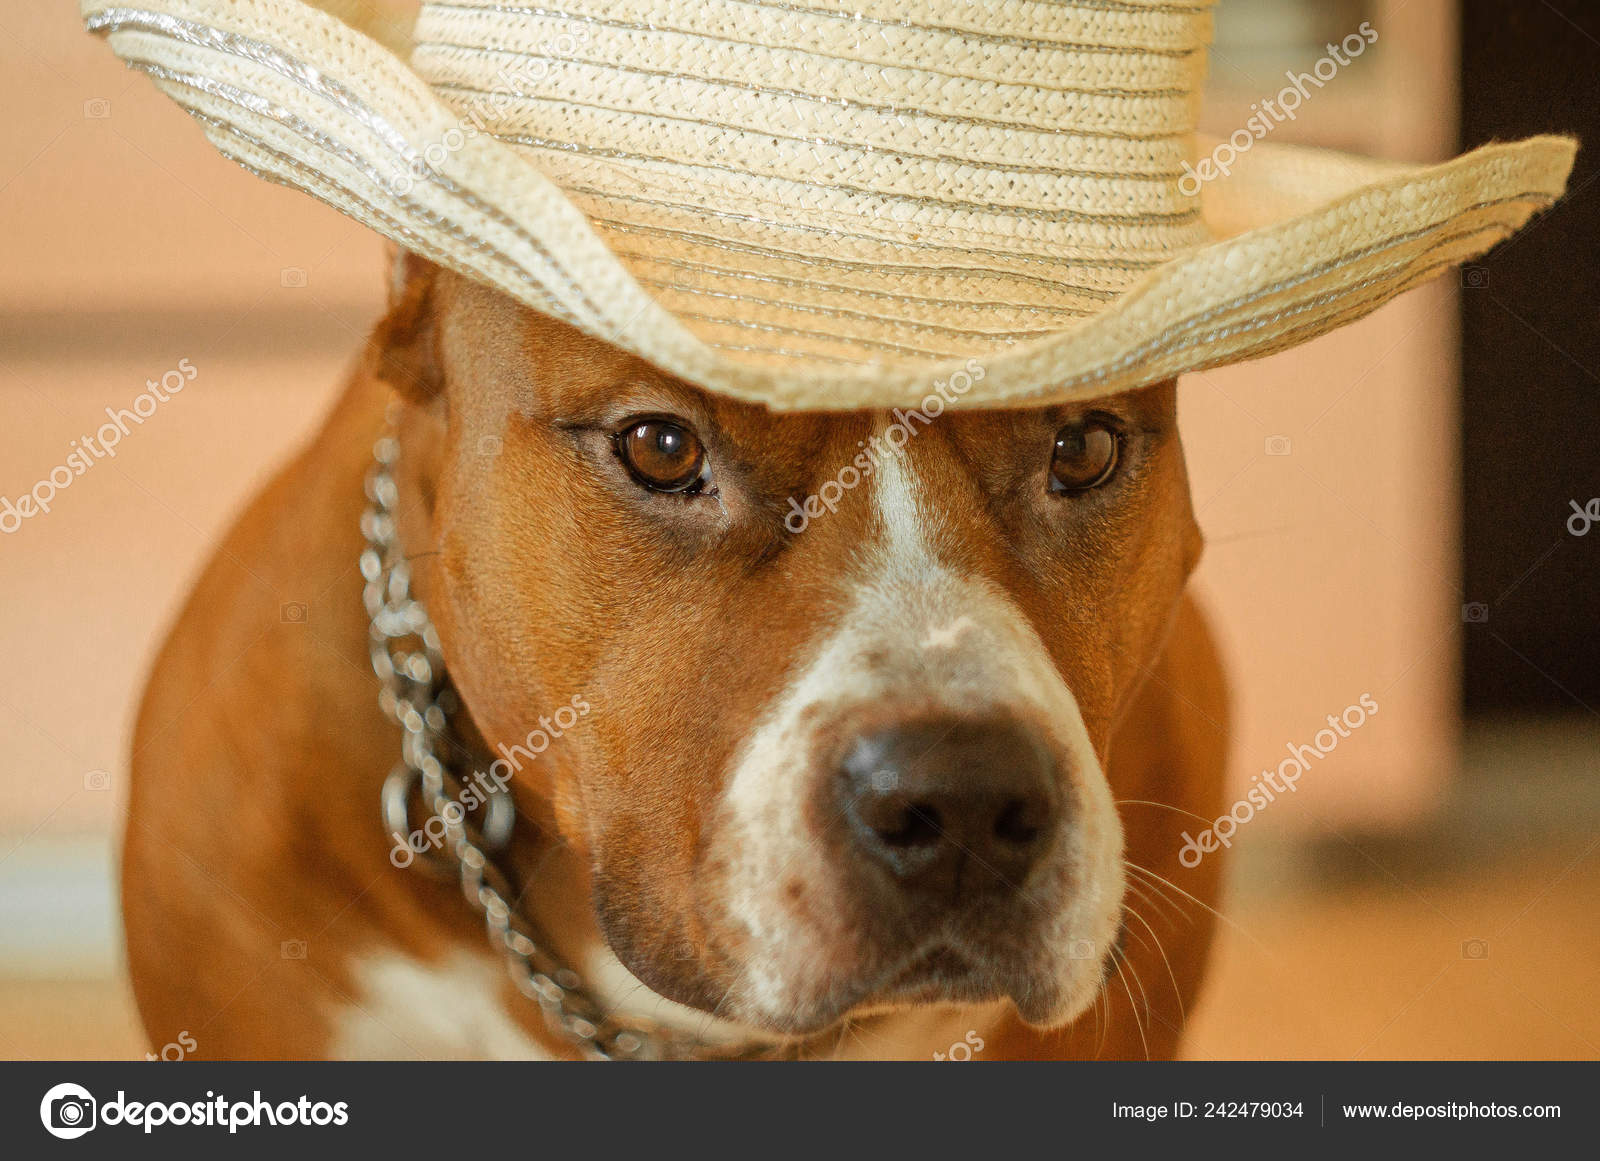 american stuff dog